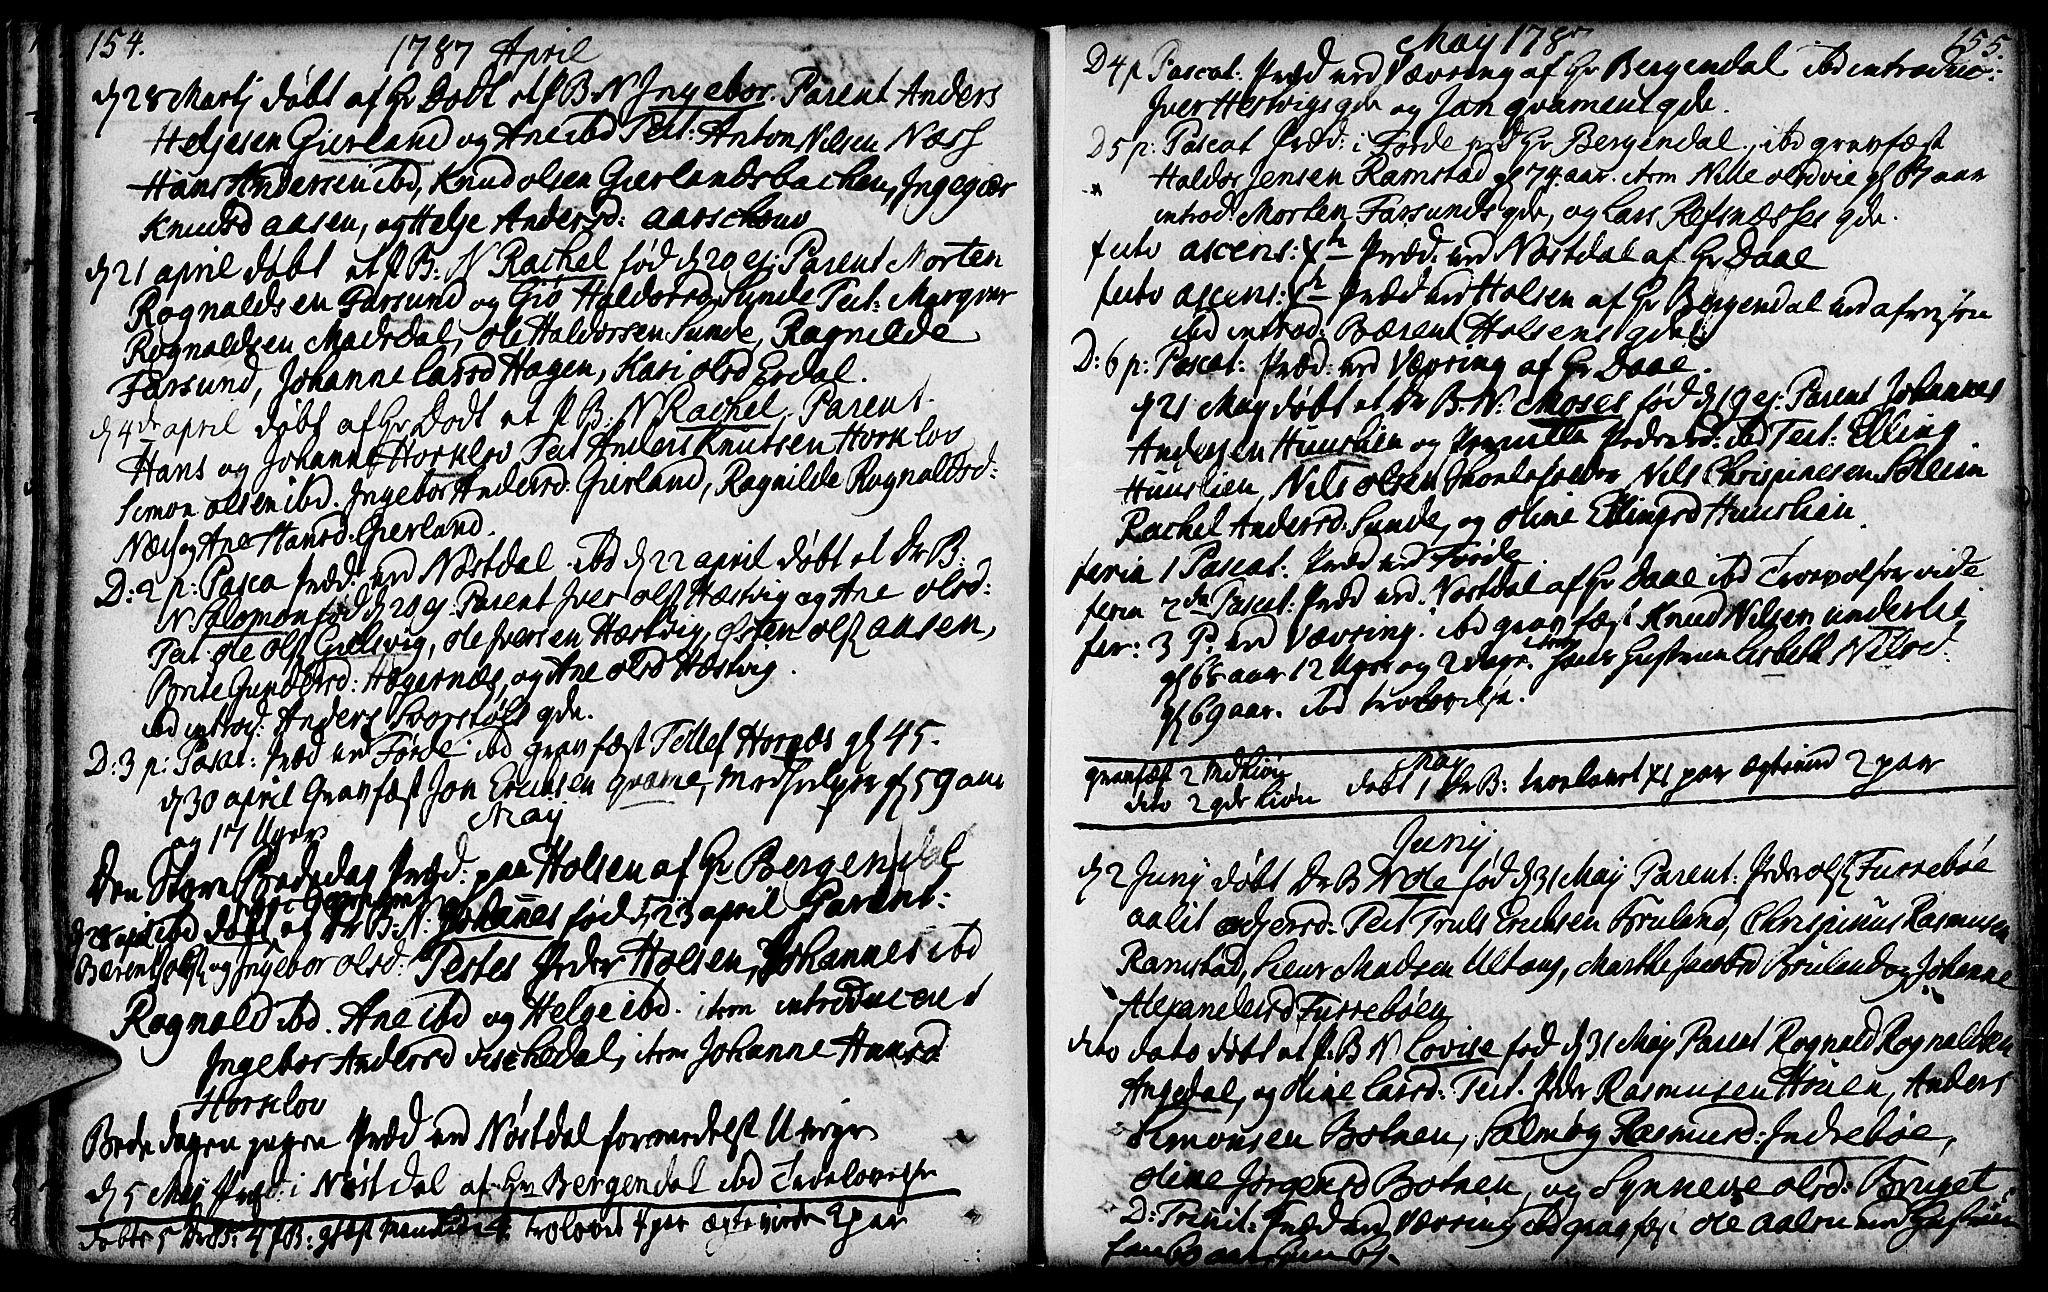 SAB, Førde sokneprestembete, H/Haa: Ministerialbok nr. A 4, 1781-1803, s. 154-155